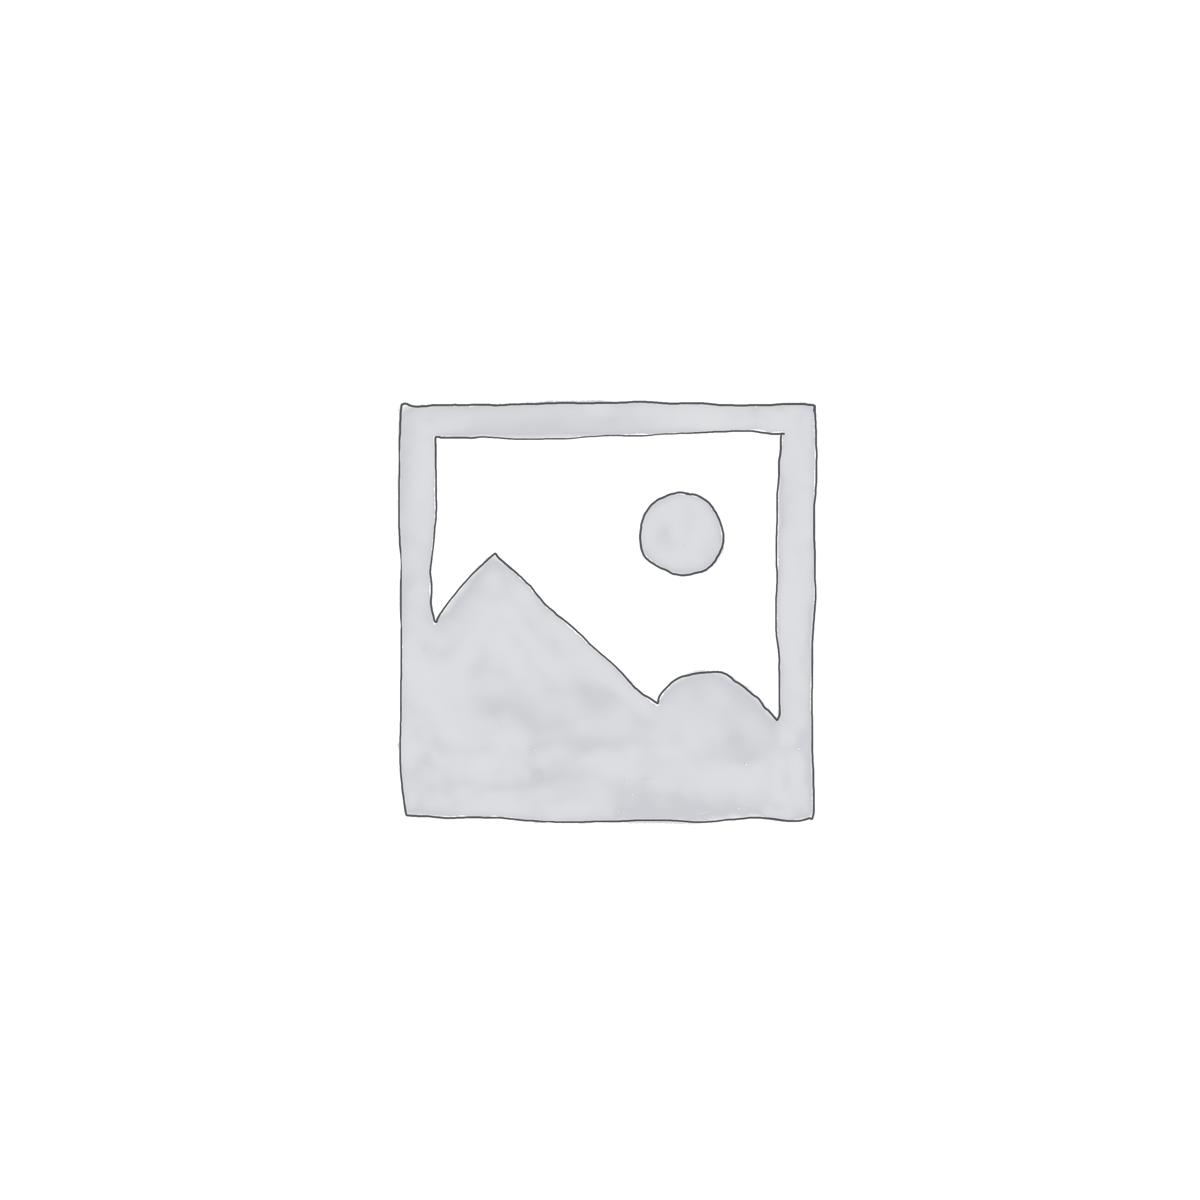 3D Look Tunnel Wallpaper Mural